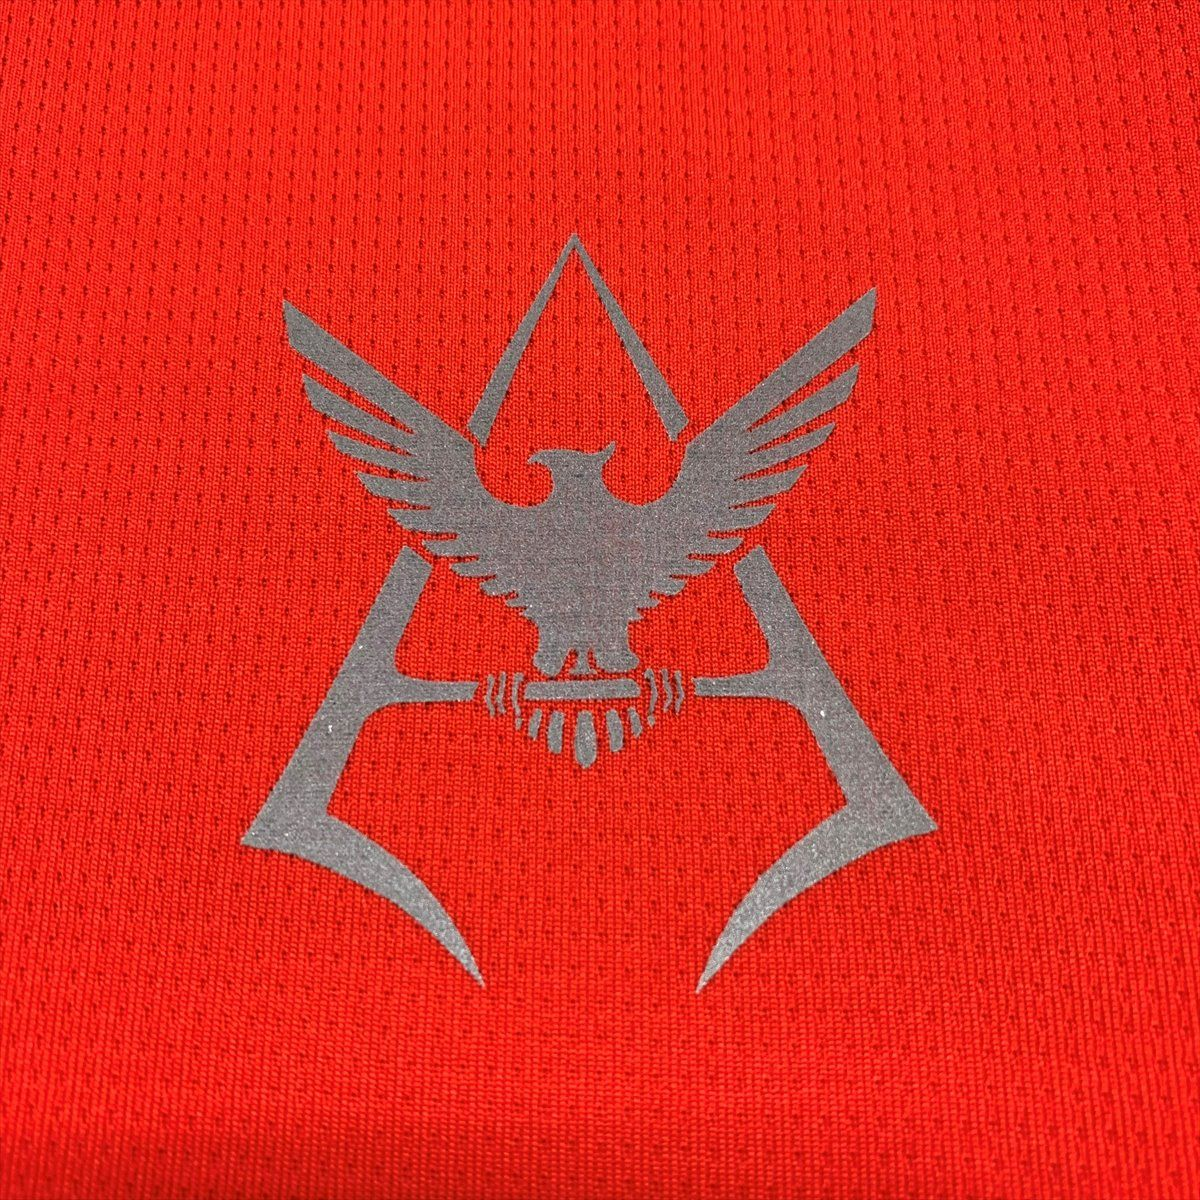 機動戰士高達 Running T-shirt